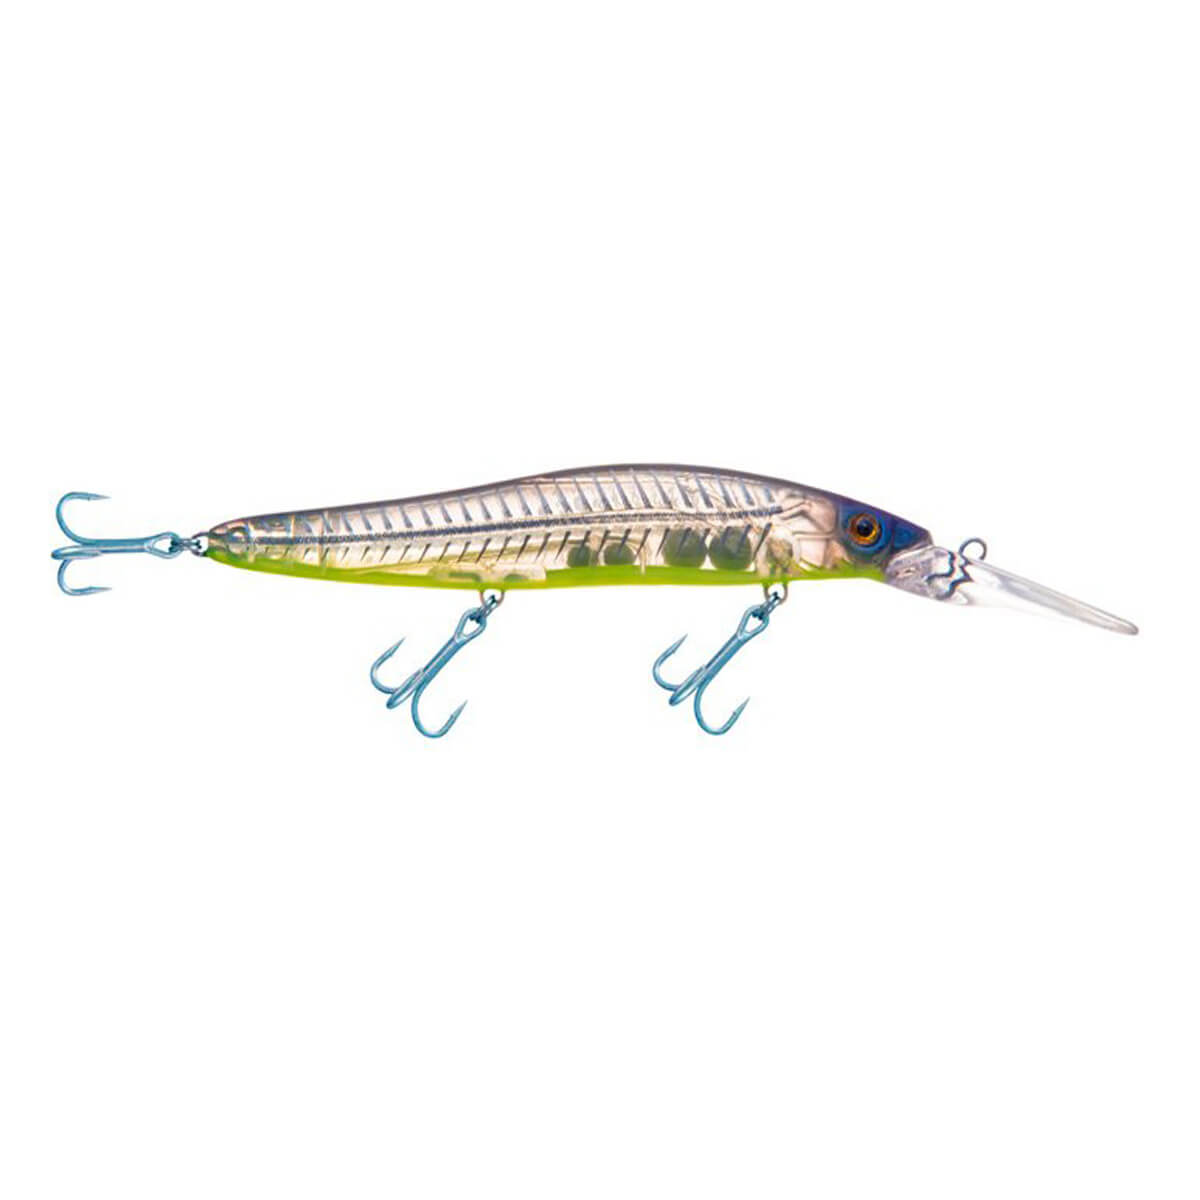 Isca Artificial Lori Mais 80  - Pró Pesca Shop